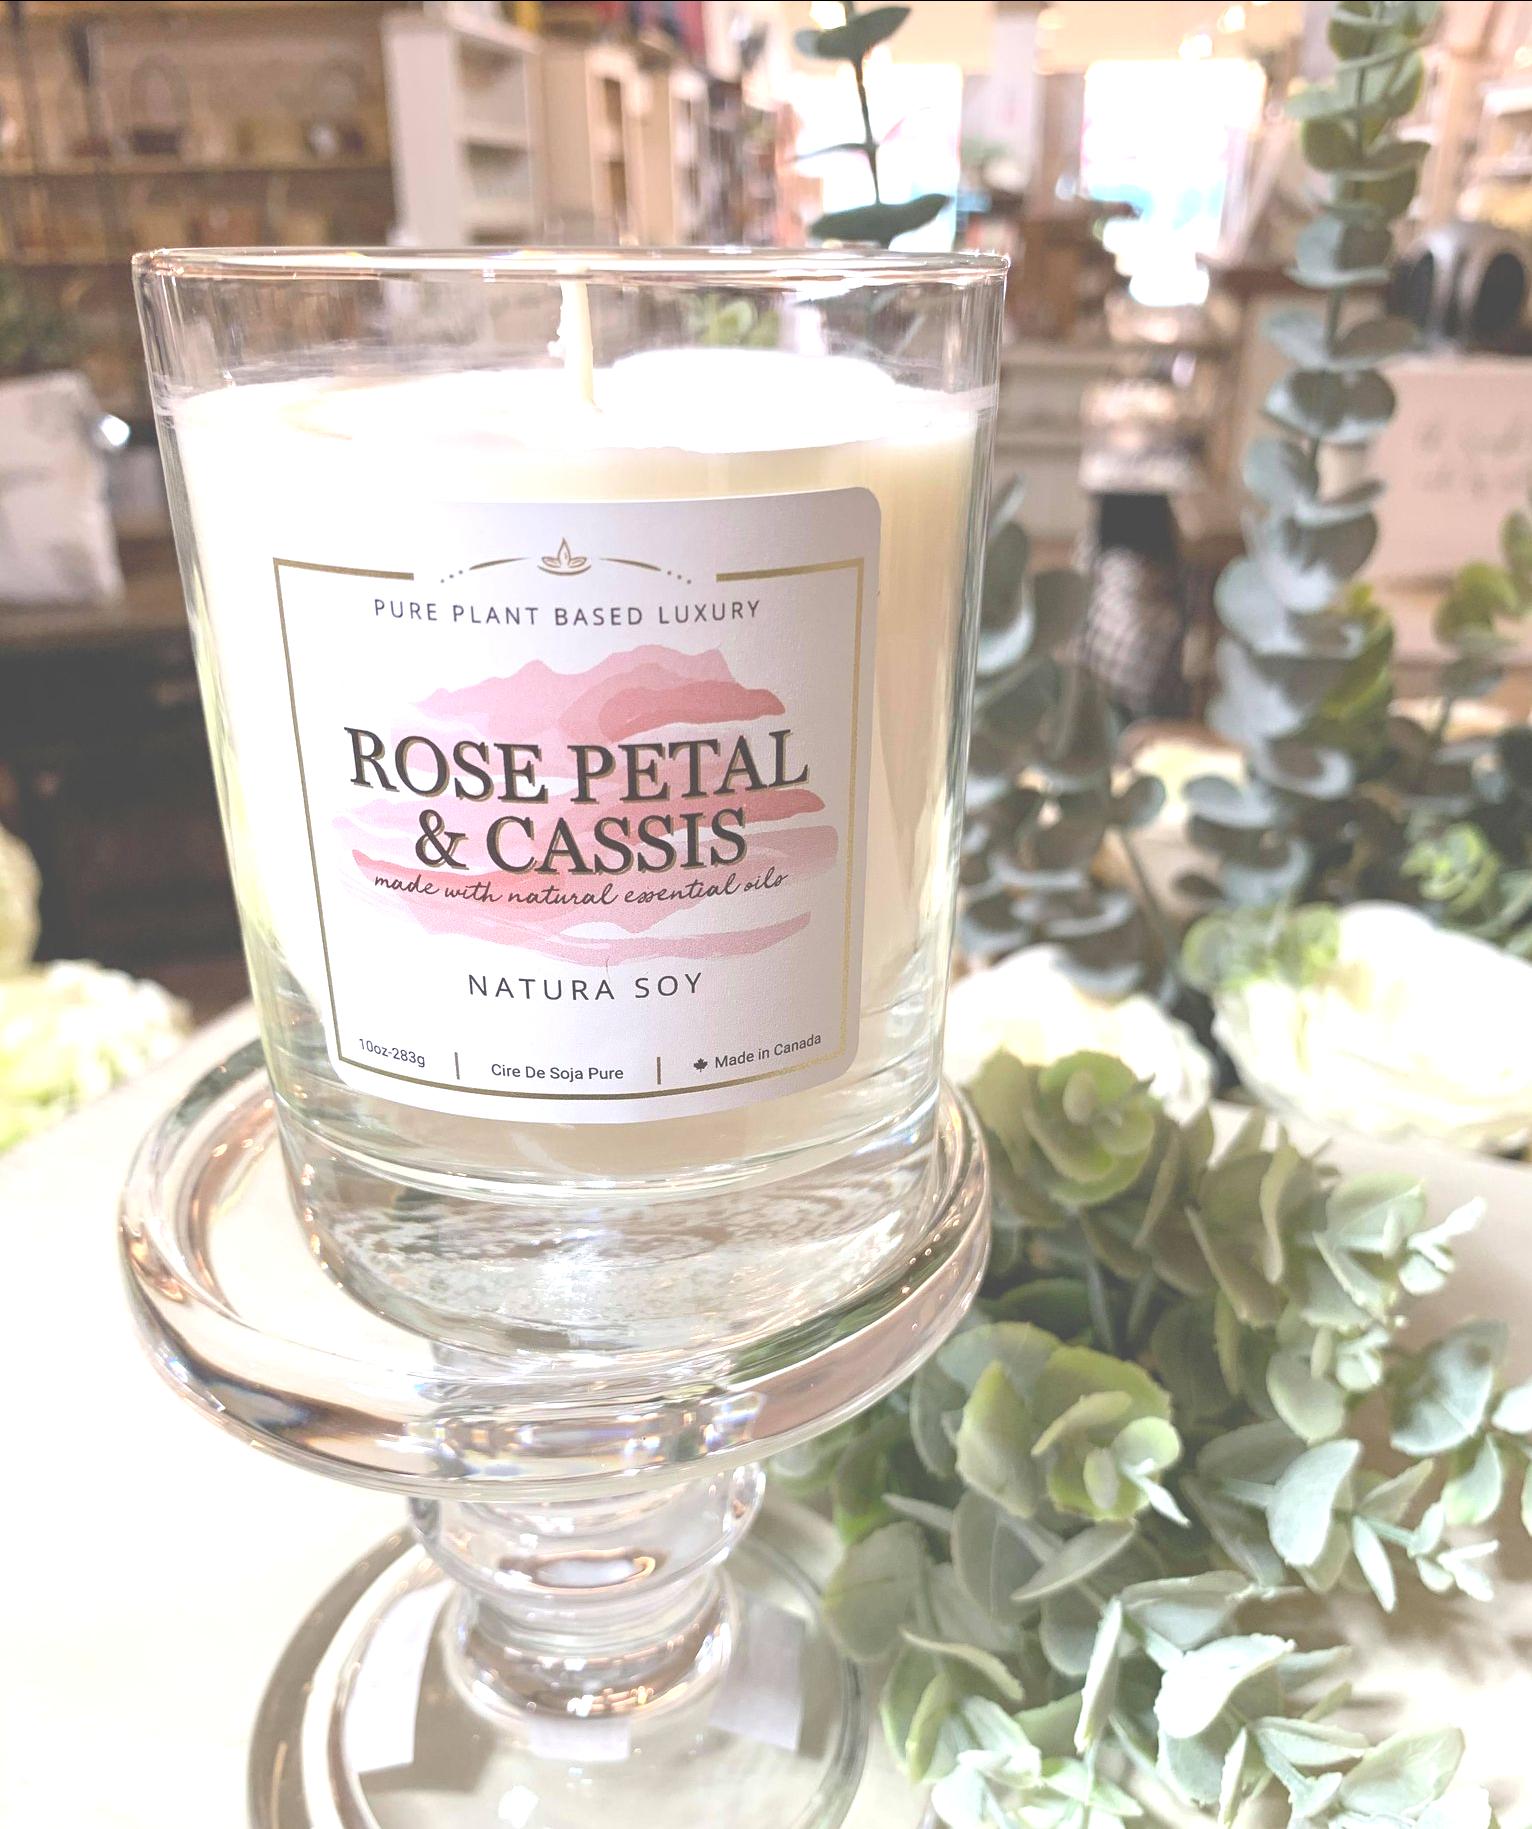 Rose Petal & Cassis Rose Petals, Cassis, English moss, and Cedarwood.